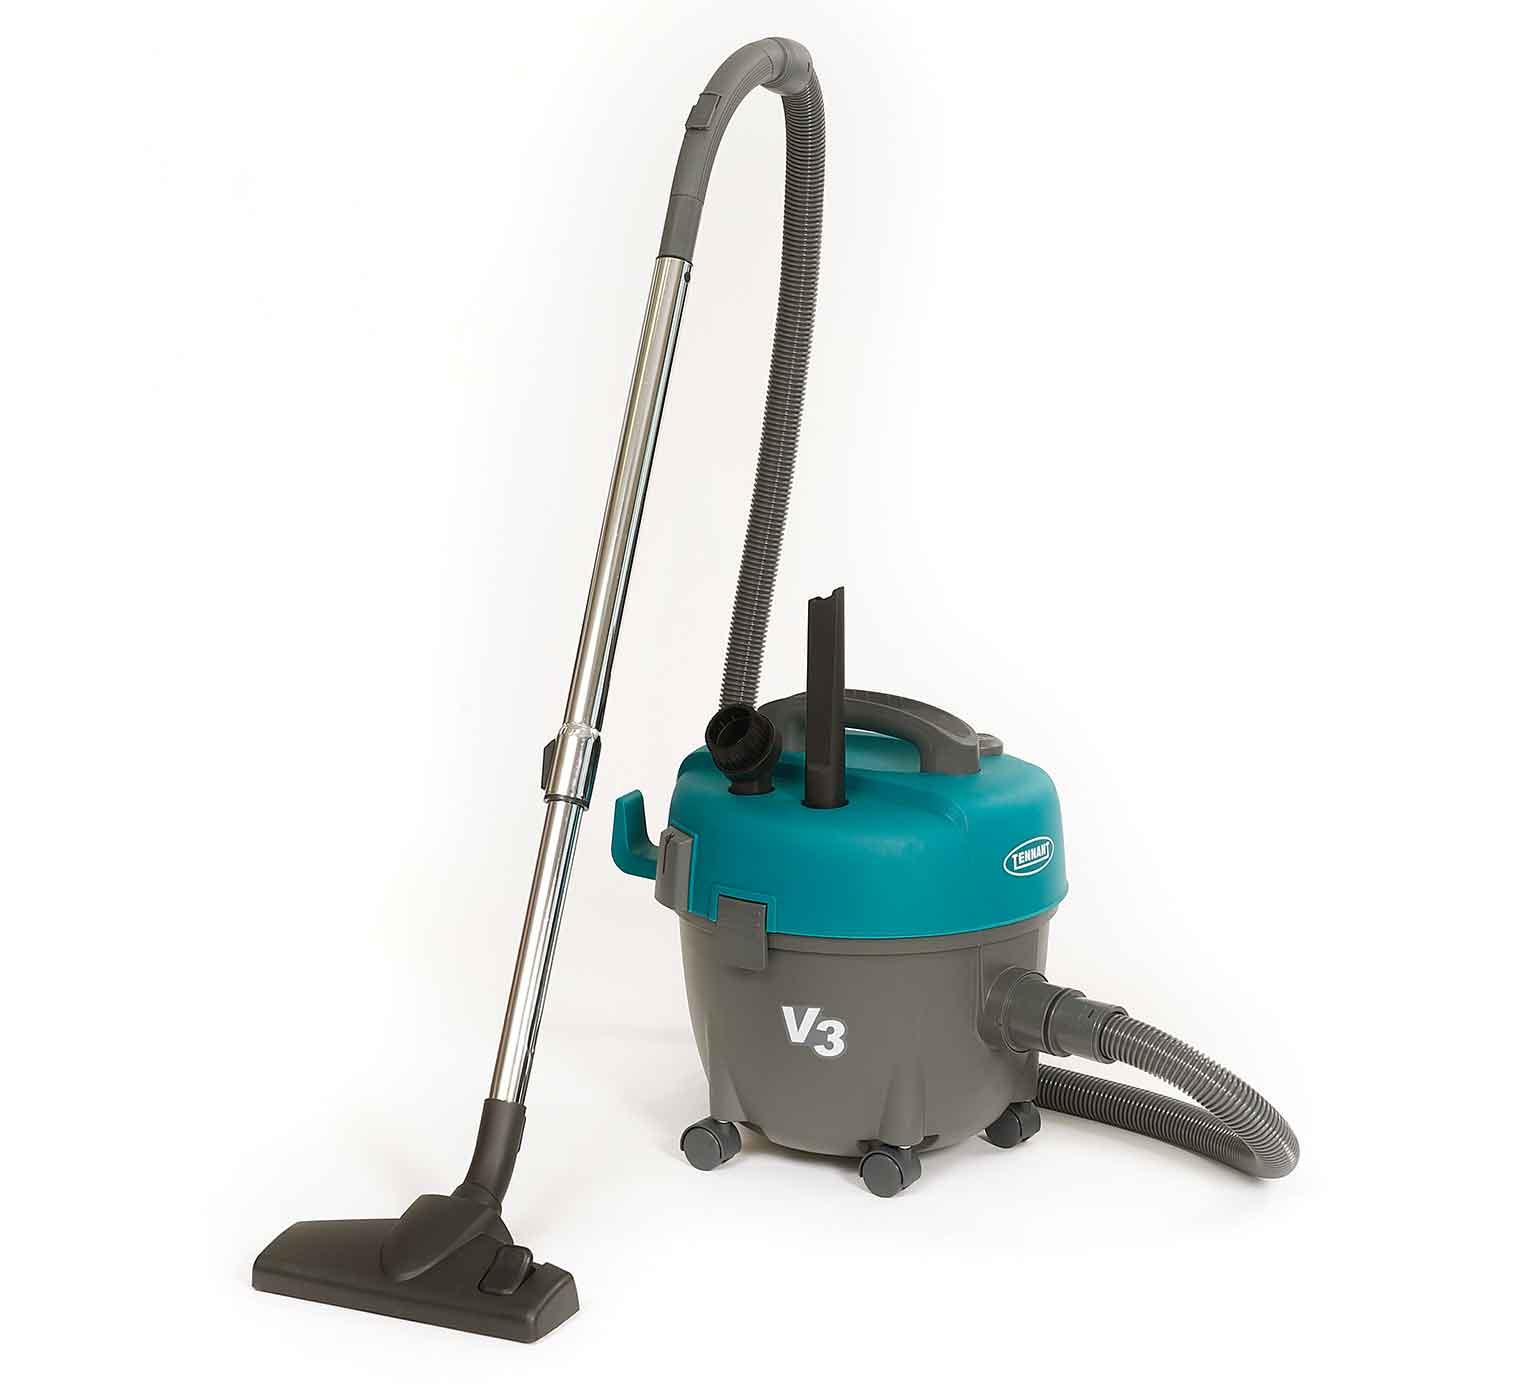 V3 Dry Canister Vacuum | Tennant Company